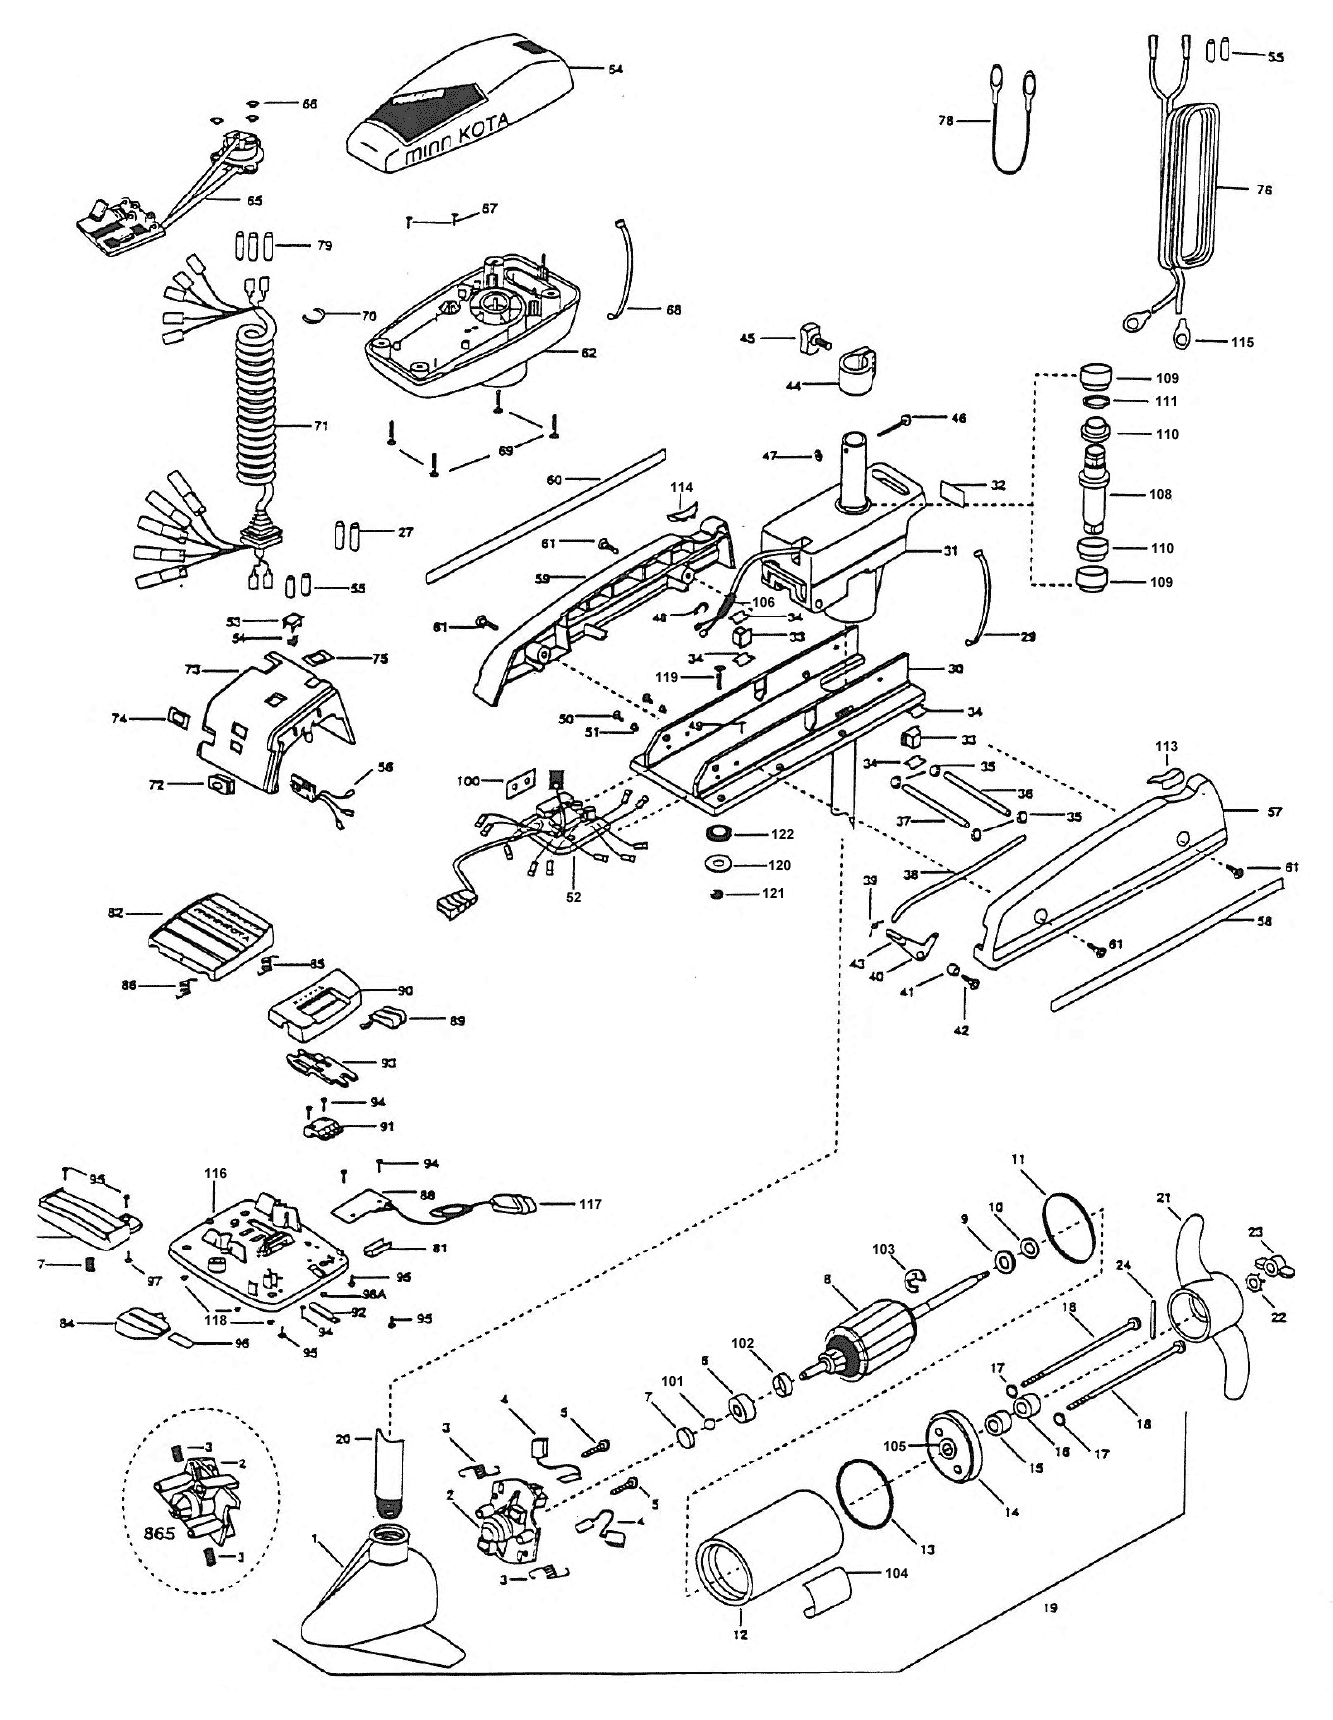 Minn Kota Auto Pilot 824 Parts